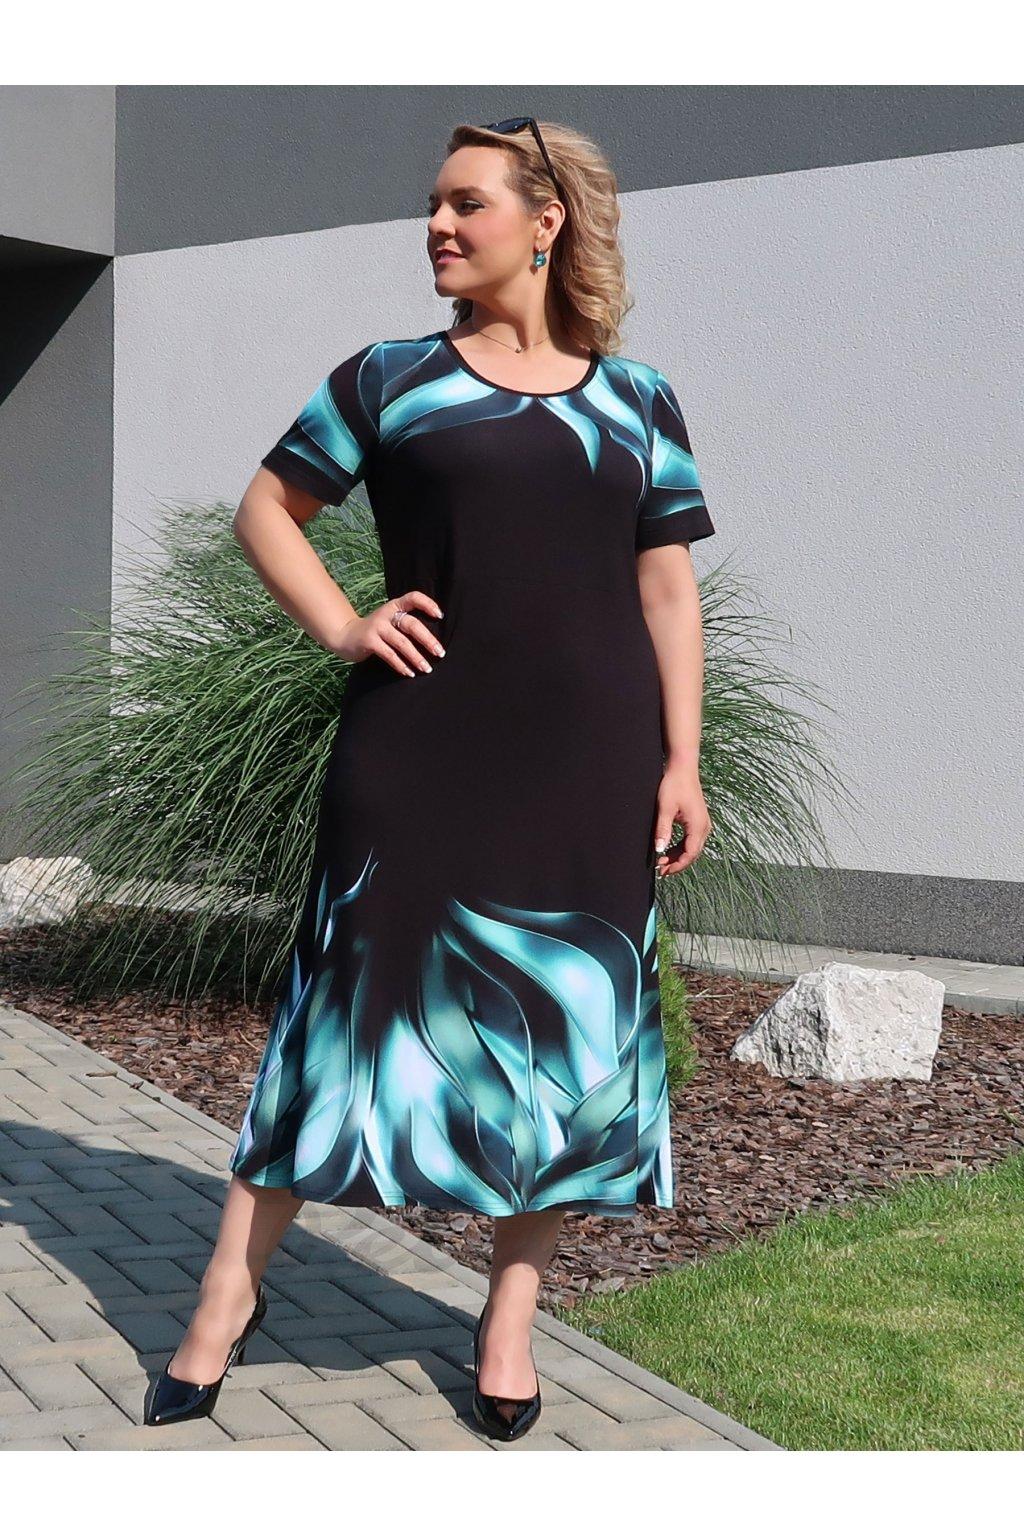 Ildika šaty (1) pro web 2